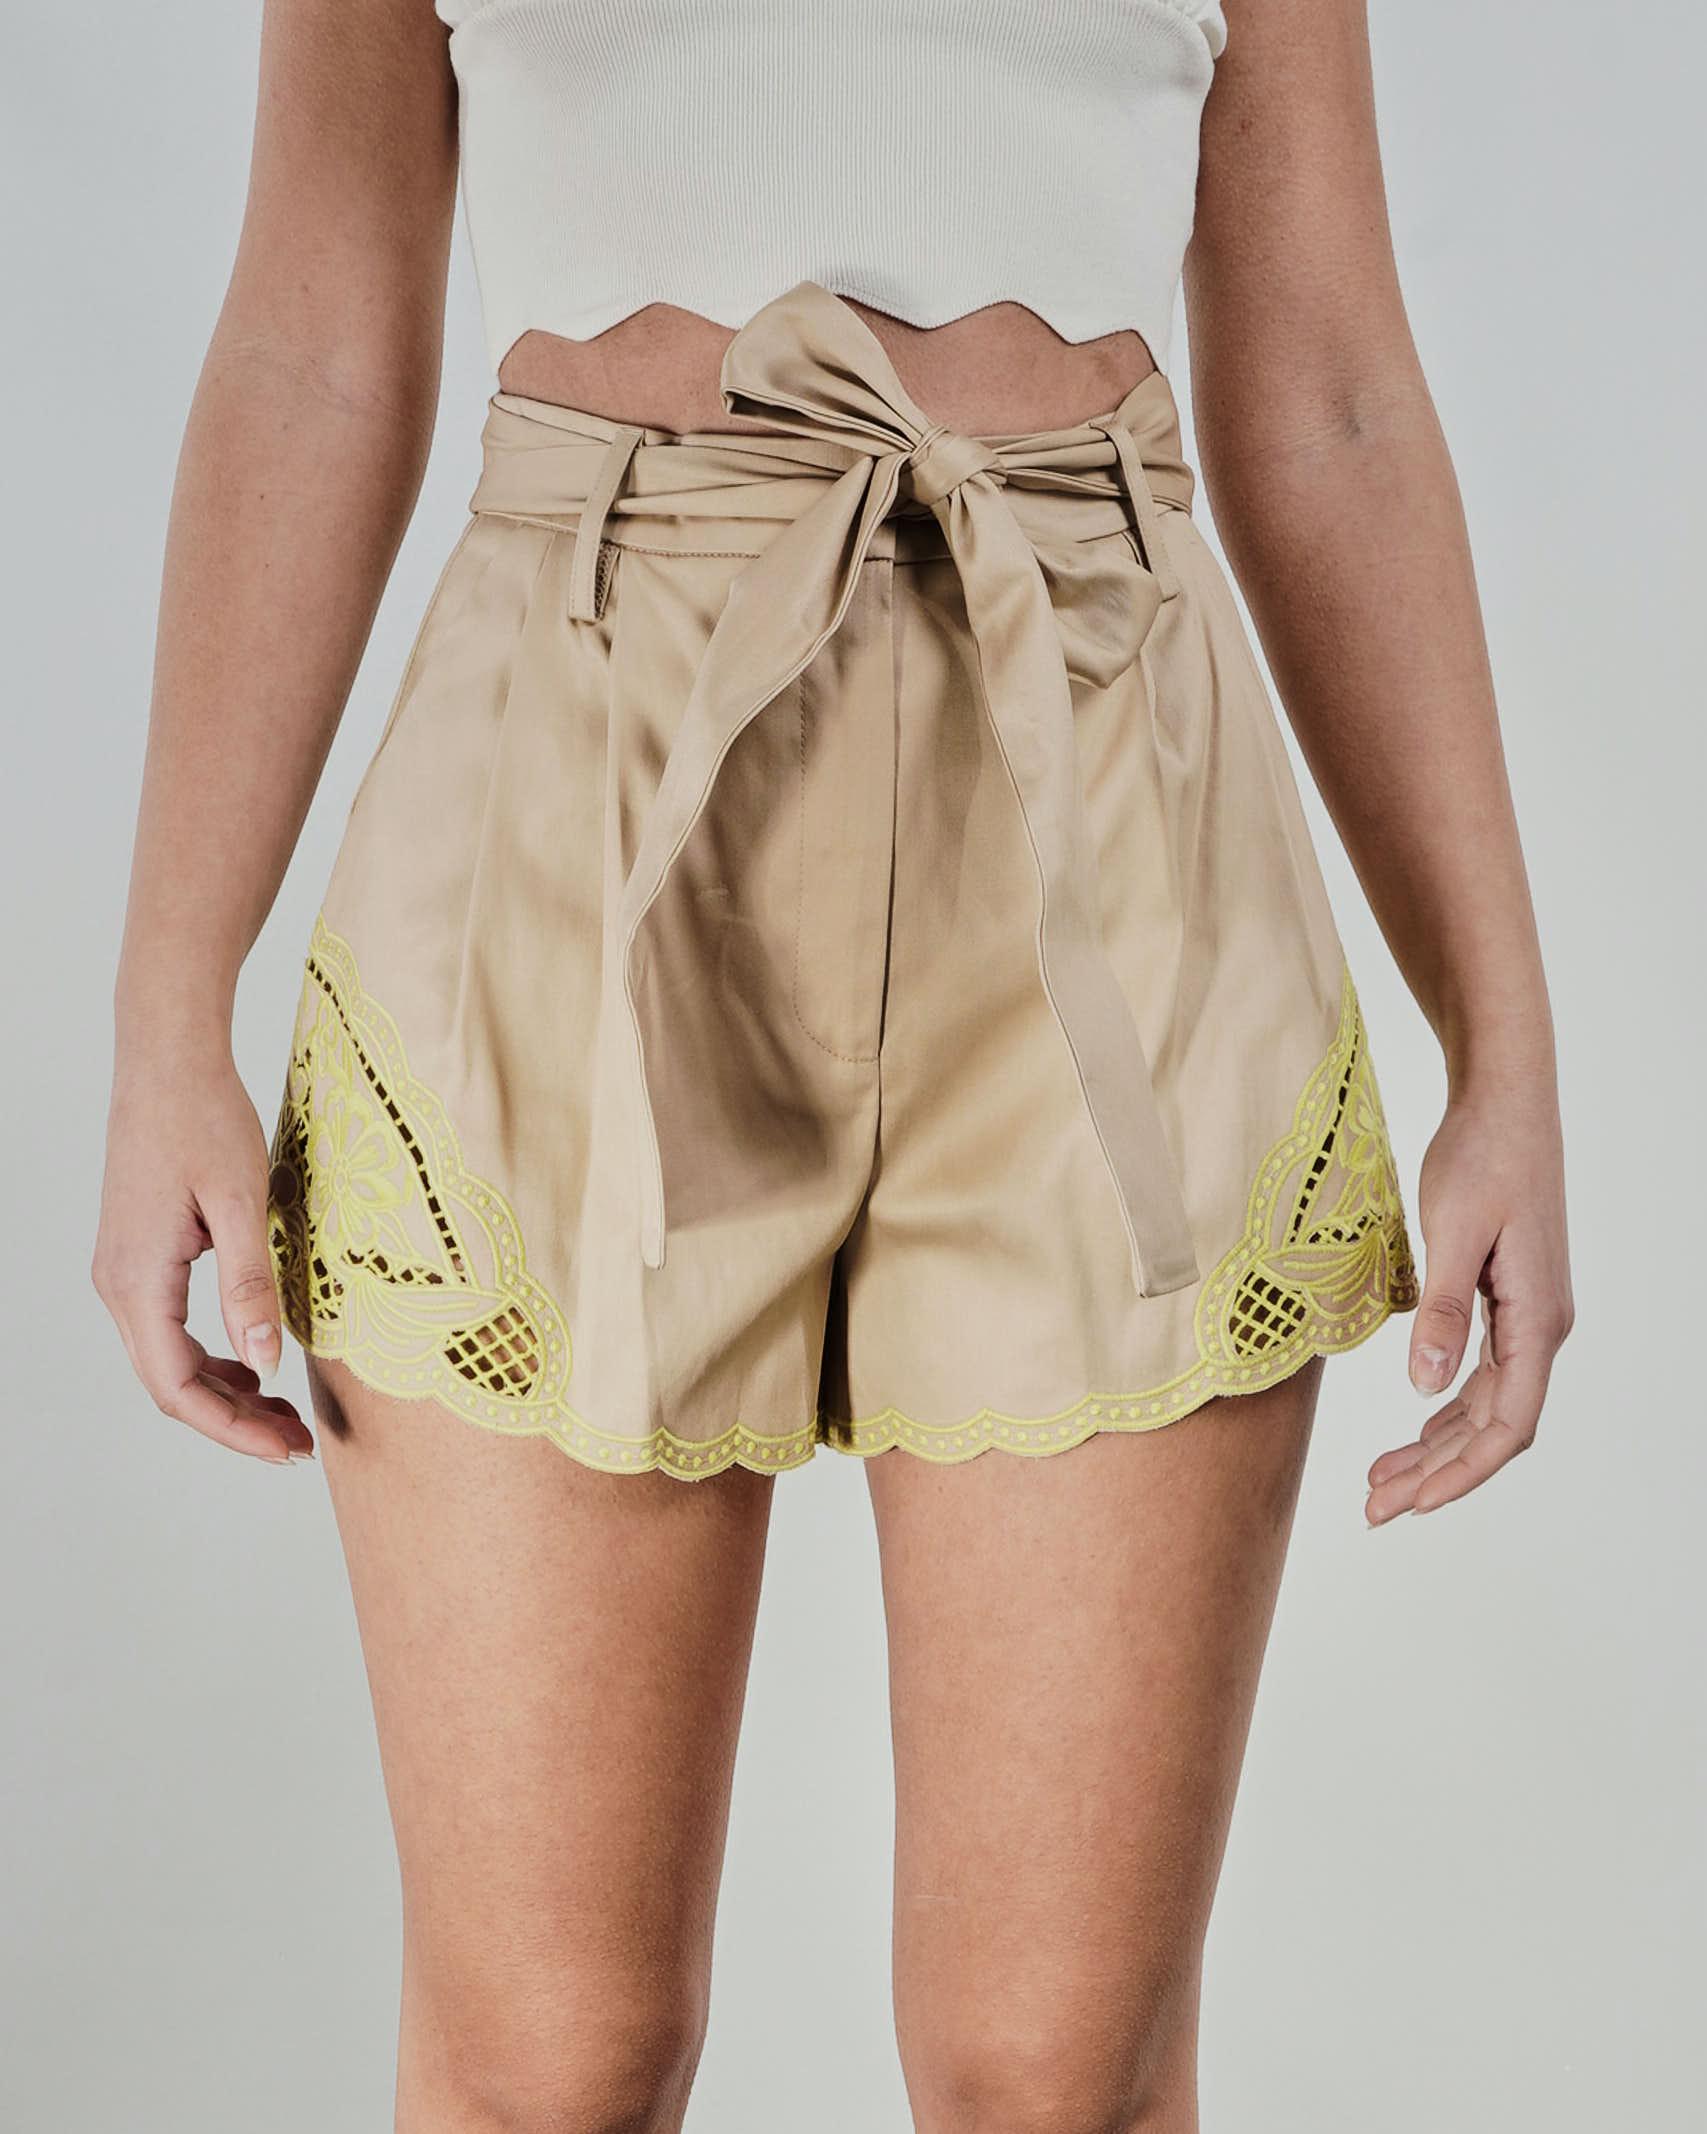 Shorts con ricamo sangallo Twinse TWIN SET | Shorts | TT20806133